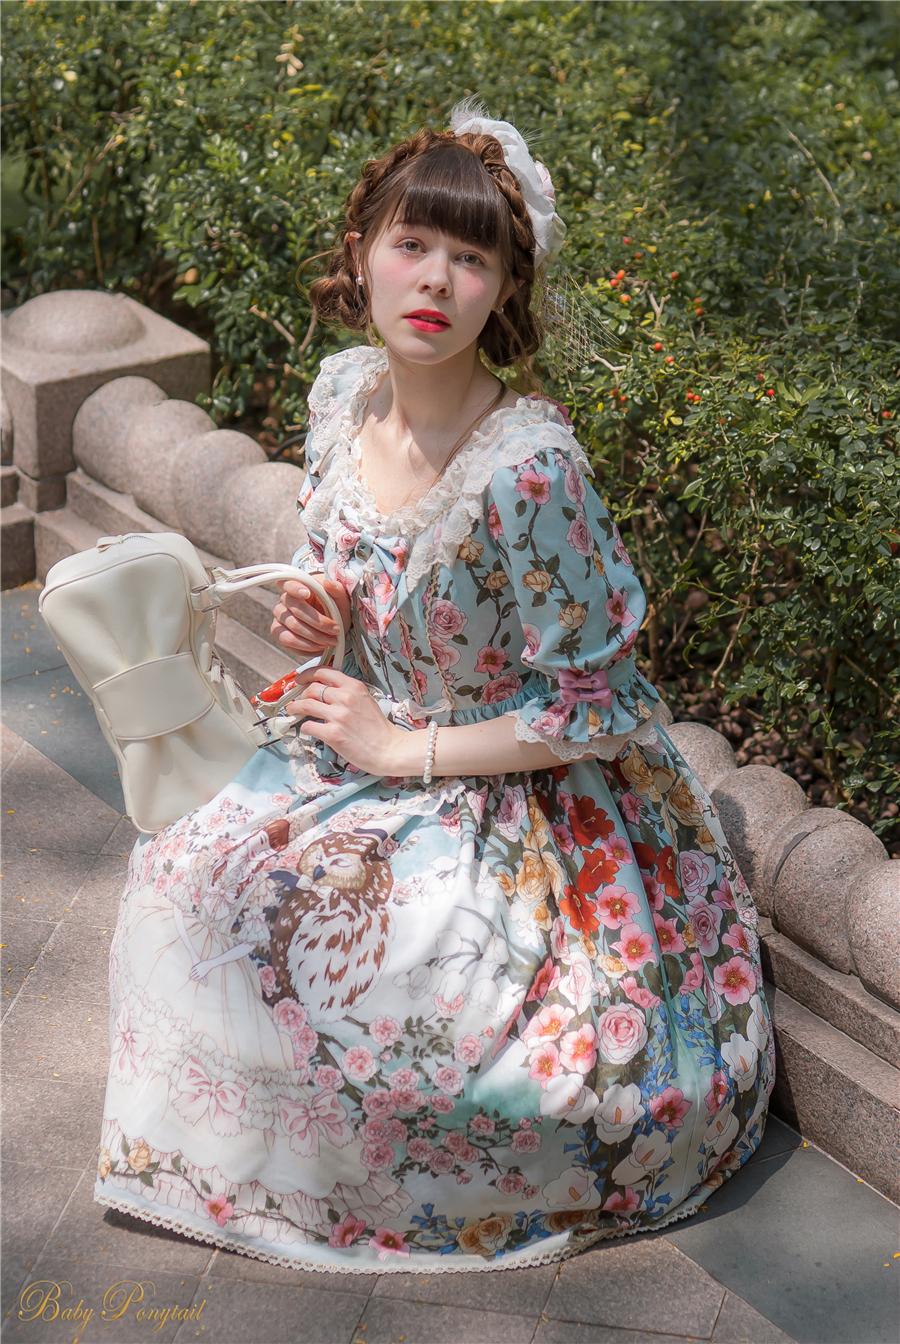 Baby Ponytail_Model Photo_Polly's Garden of Dreams_OP Lagoon Blue_Claudia_17.jpg